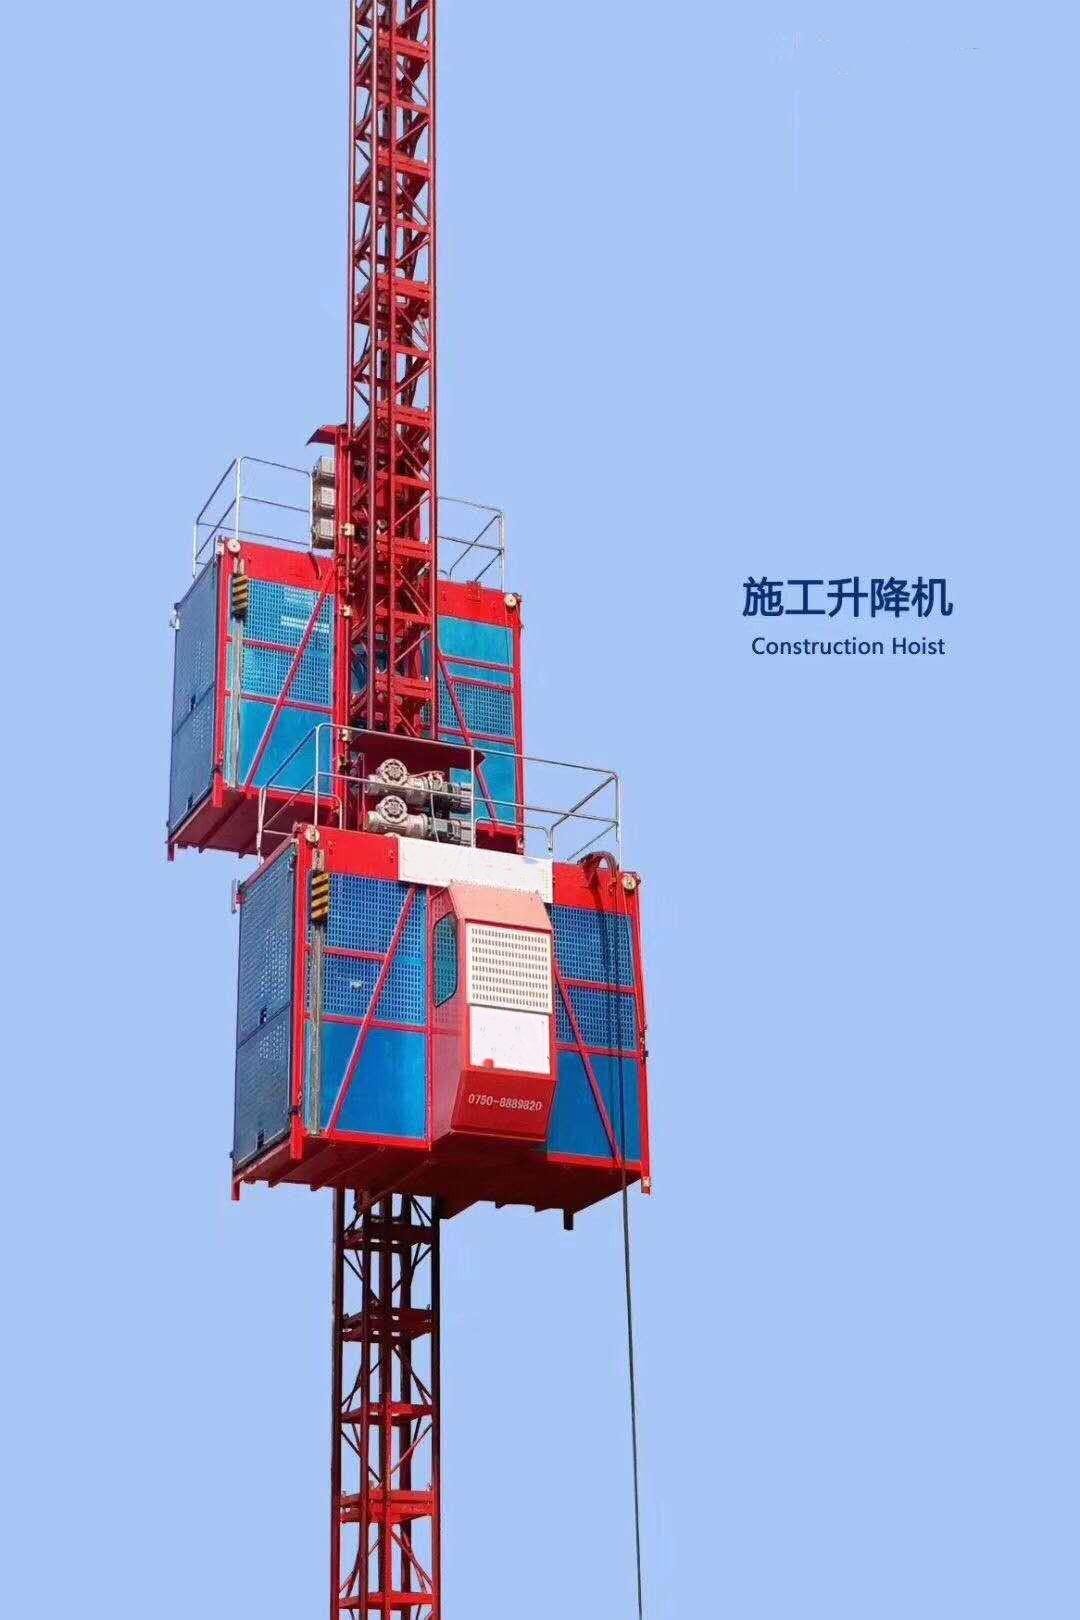 Construction Hoist with inverter